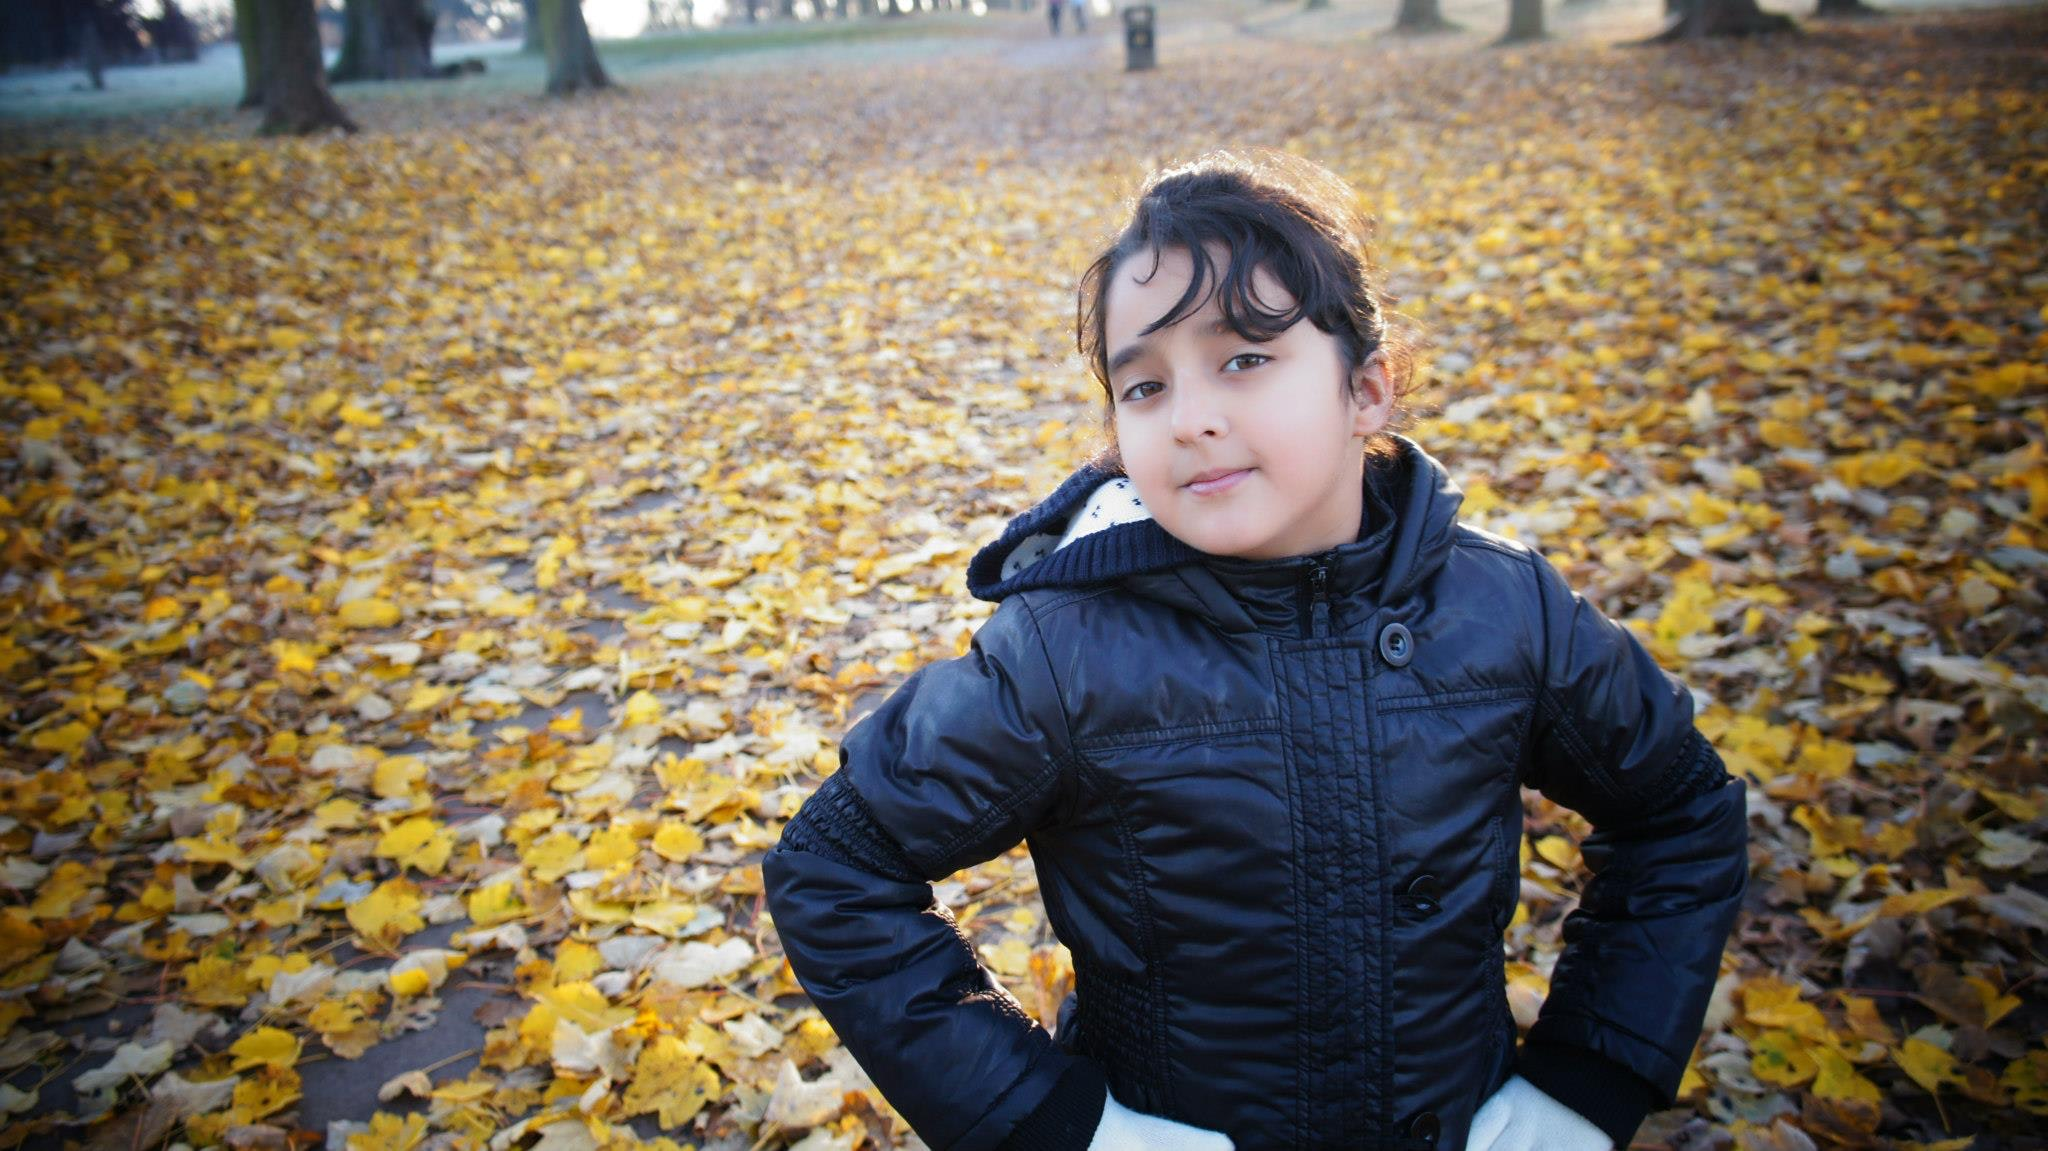 Free Unsplash photo from Zulfiqar ahmed